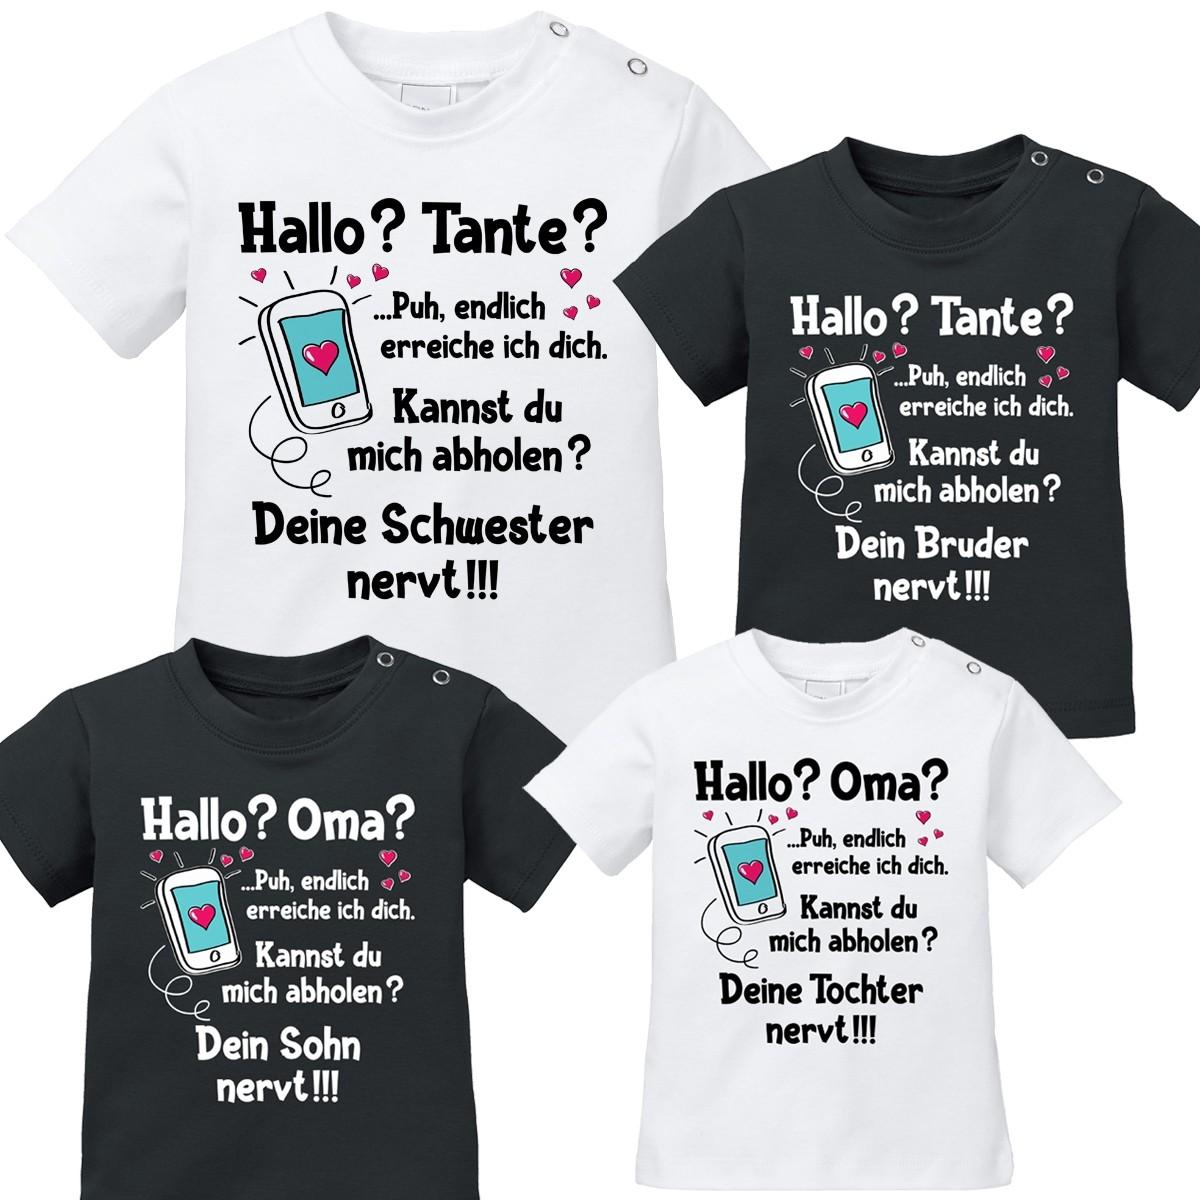 Babyshirt: Hallo? Tante / Oma?